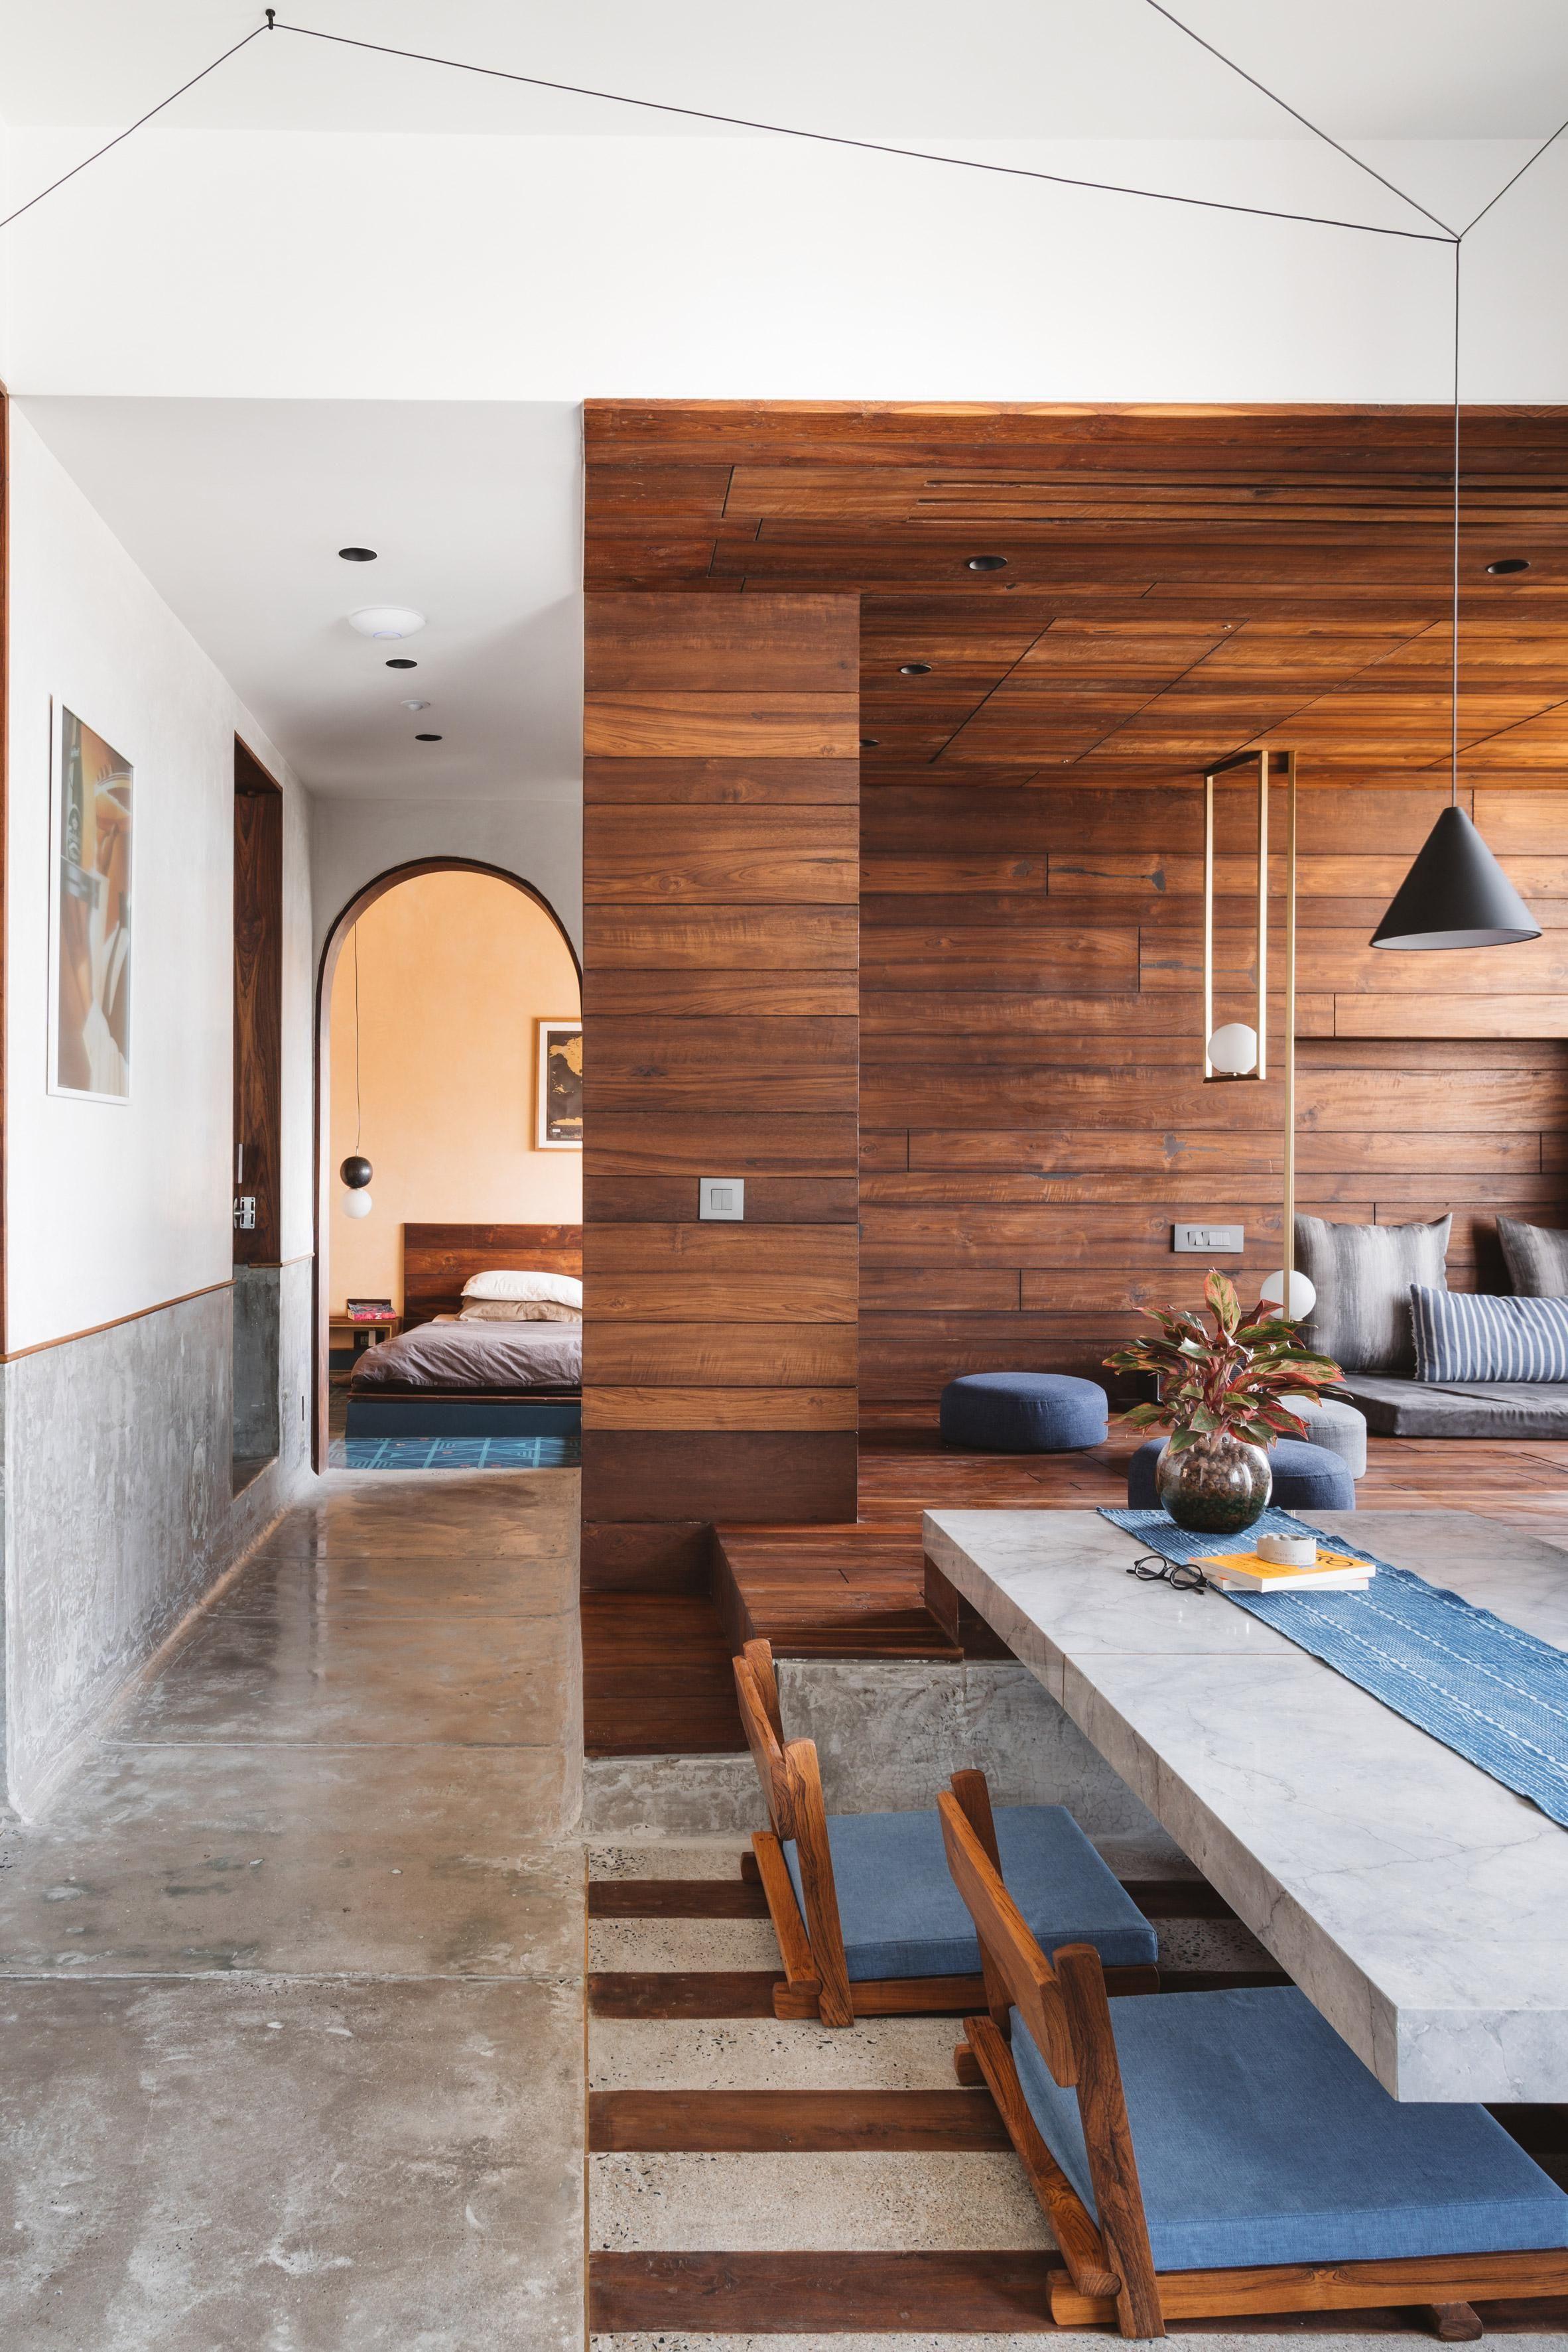 Studio Apartment by Sāransh Architects in Ahmedabad India